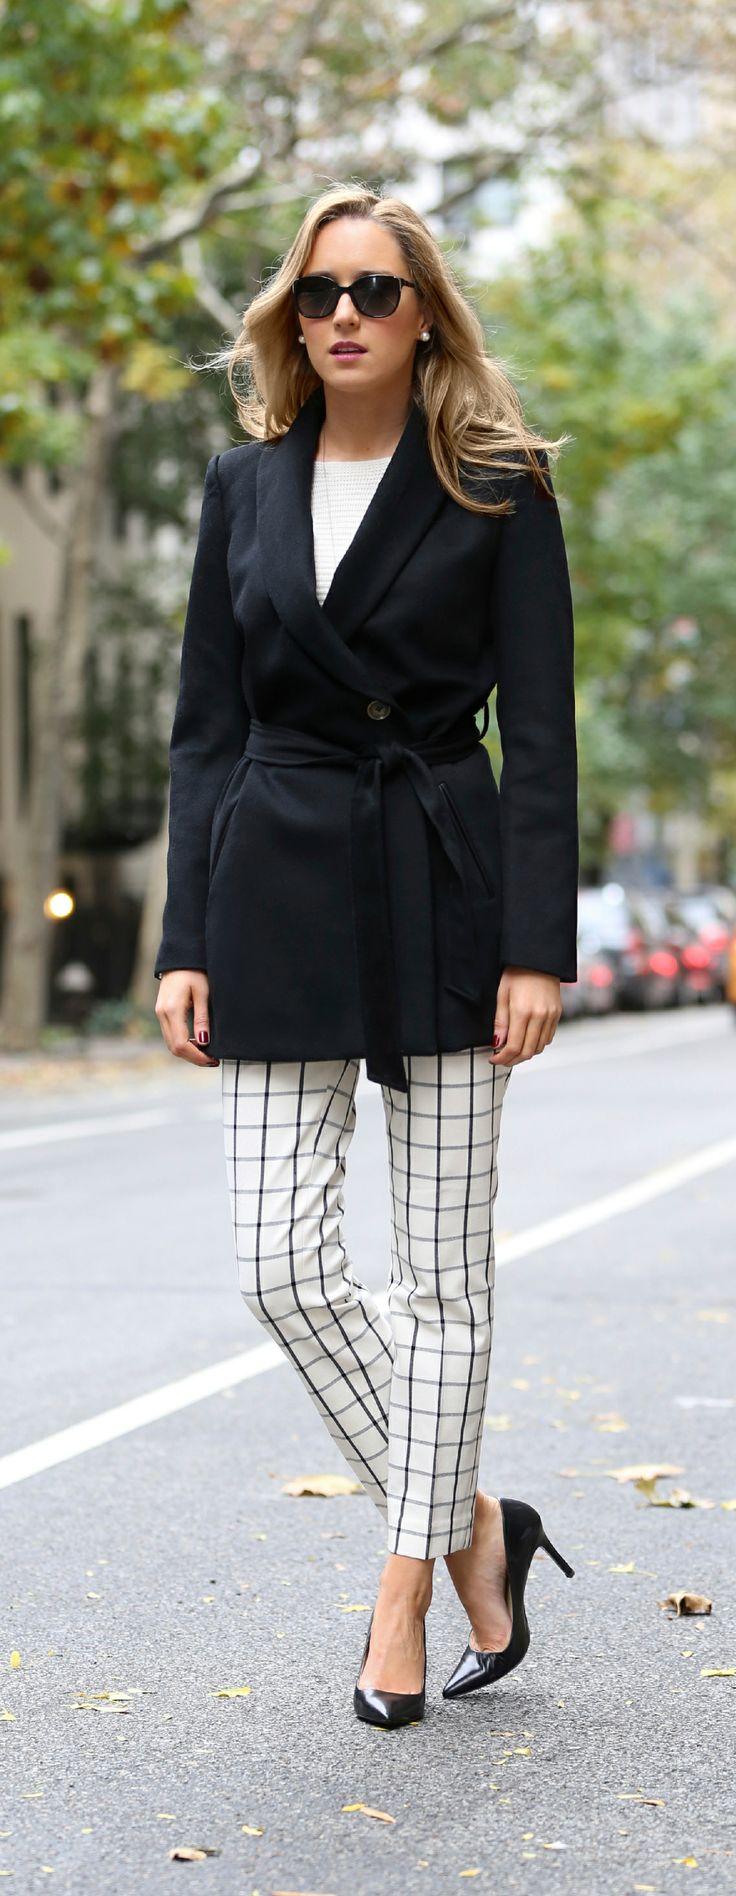 The Classy Cubicle: Ivory {windowpane cropped pants, banana republic, ann taylor, tart collections, ralph lauren, gorjana, work wear, office fashion}